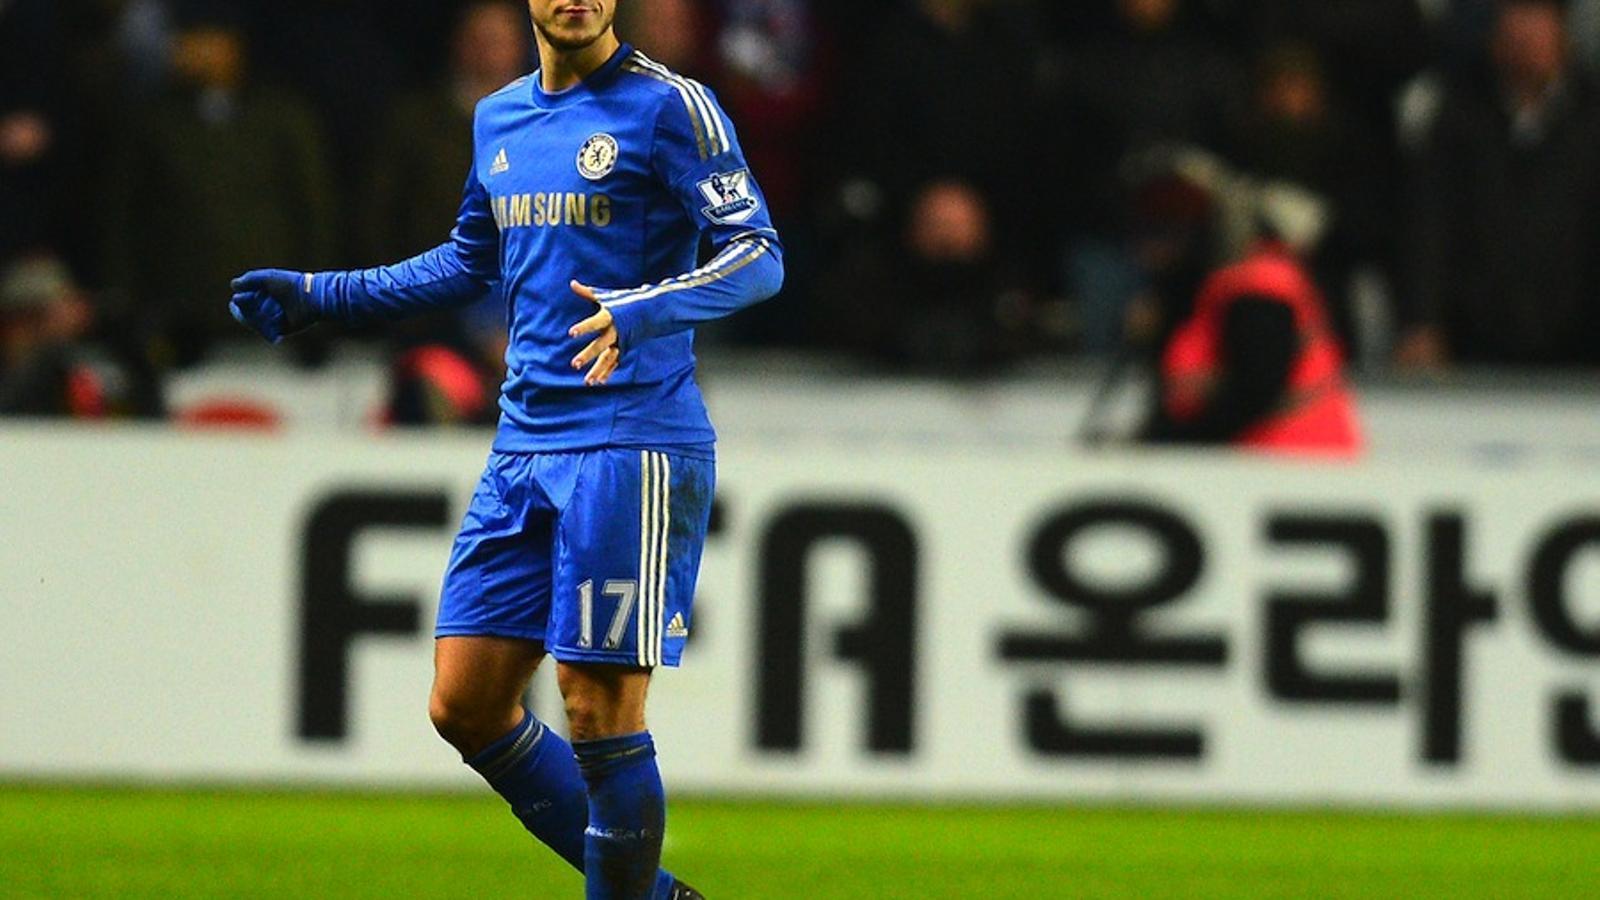 Eden Hazard agredeix un nen aplegapilotes